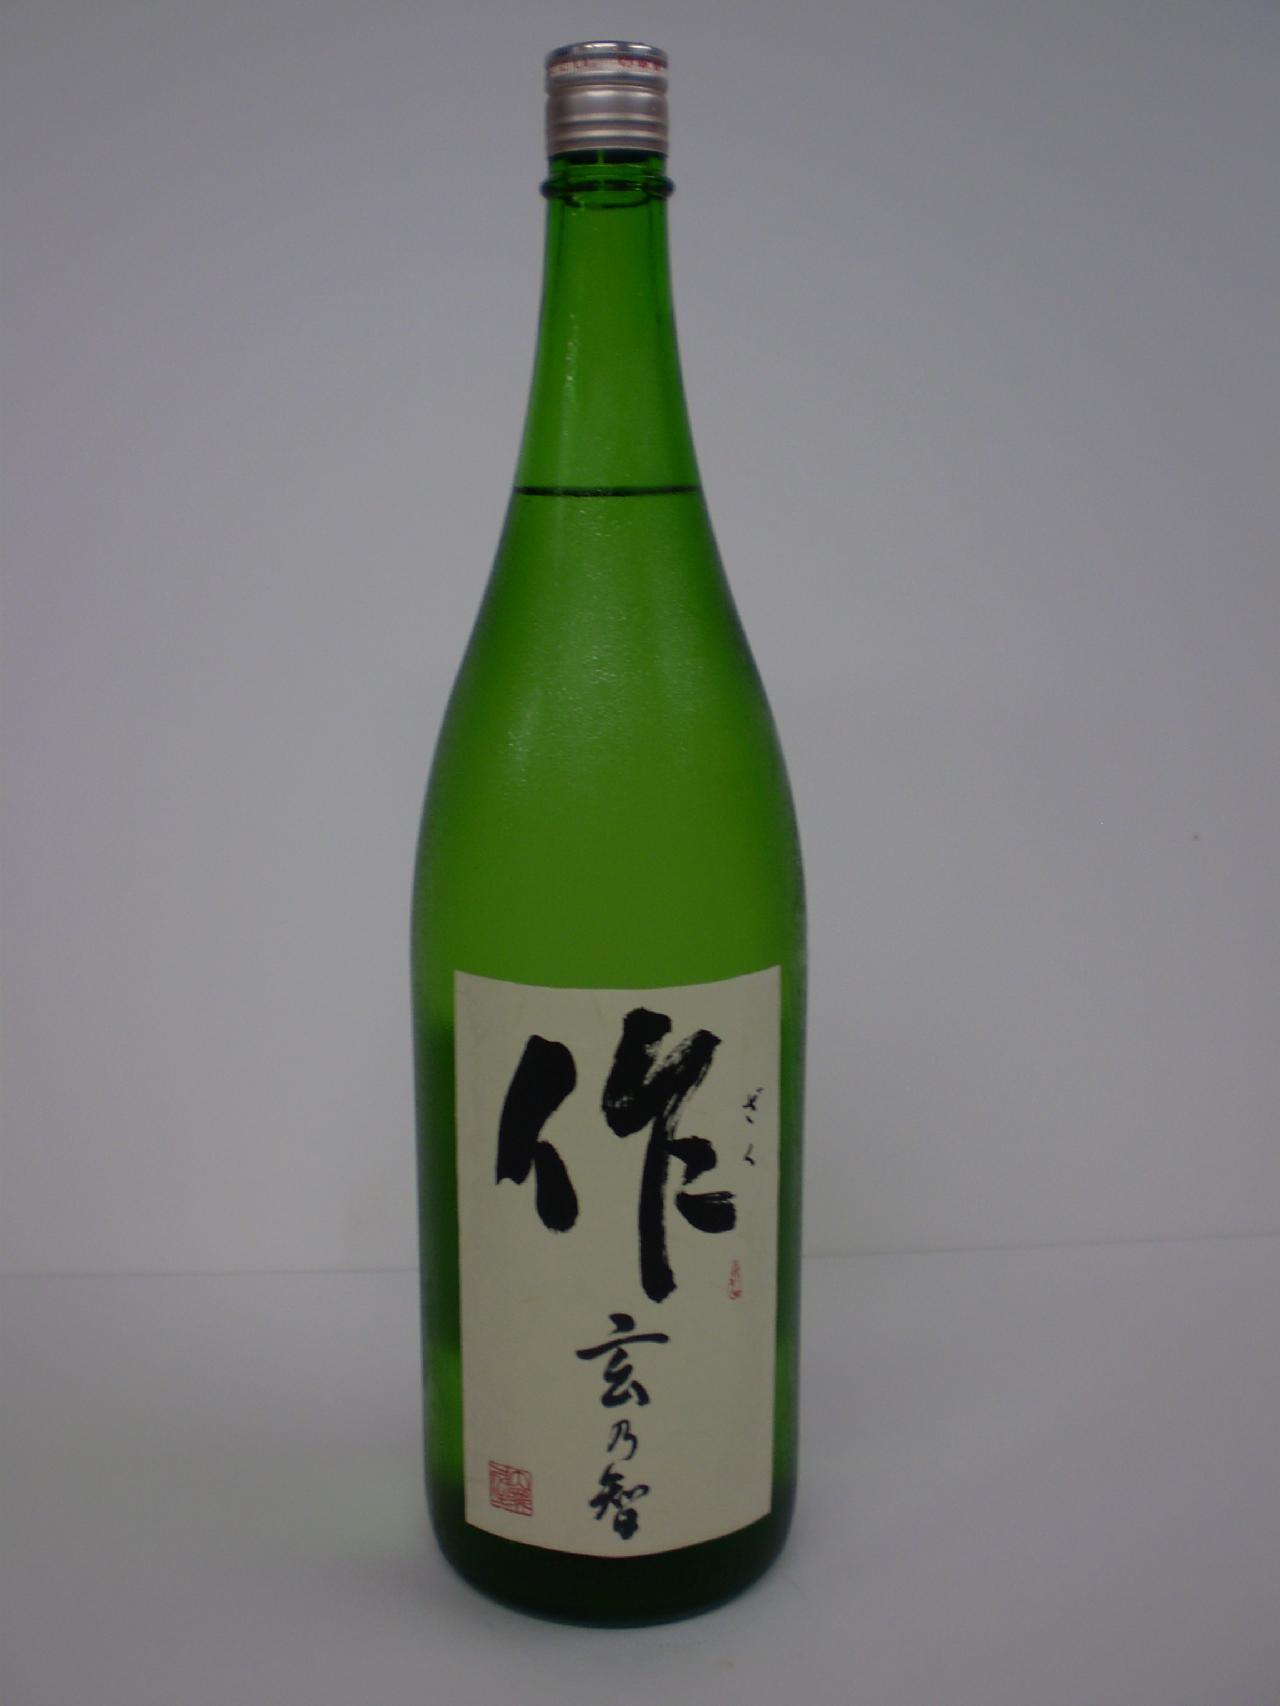 作(ざく)純米 玄乃智 1800ml 清水清三郎商店